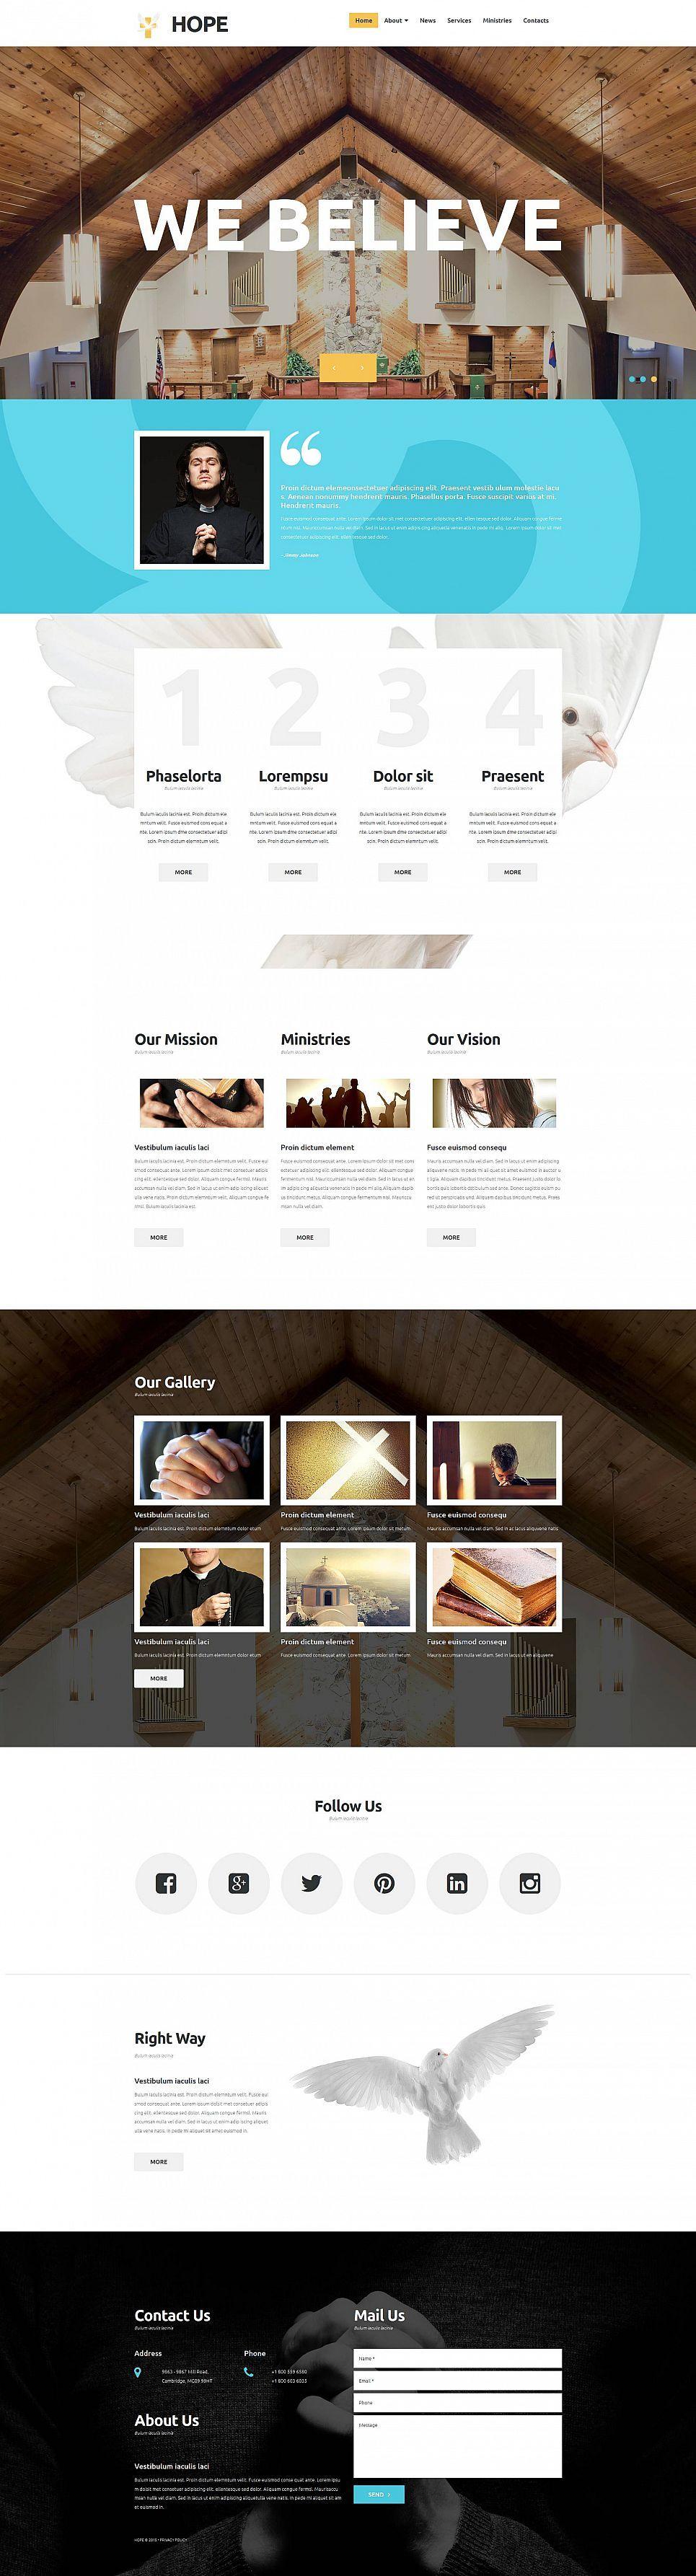 Religious Responsive Moto CMS 3 Template | Design Bundle